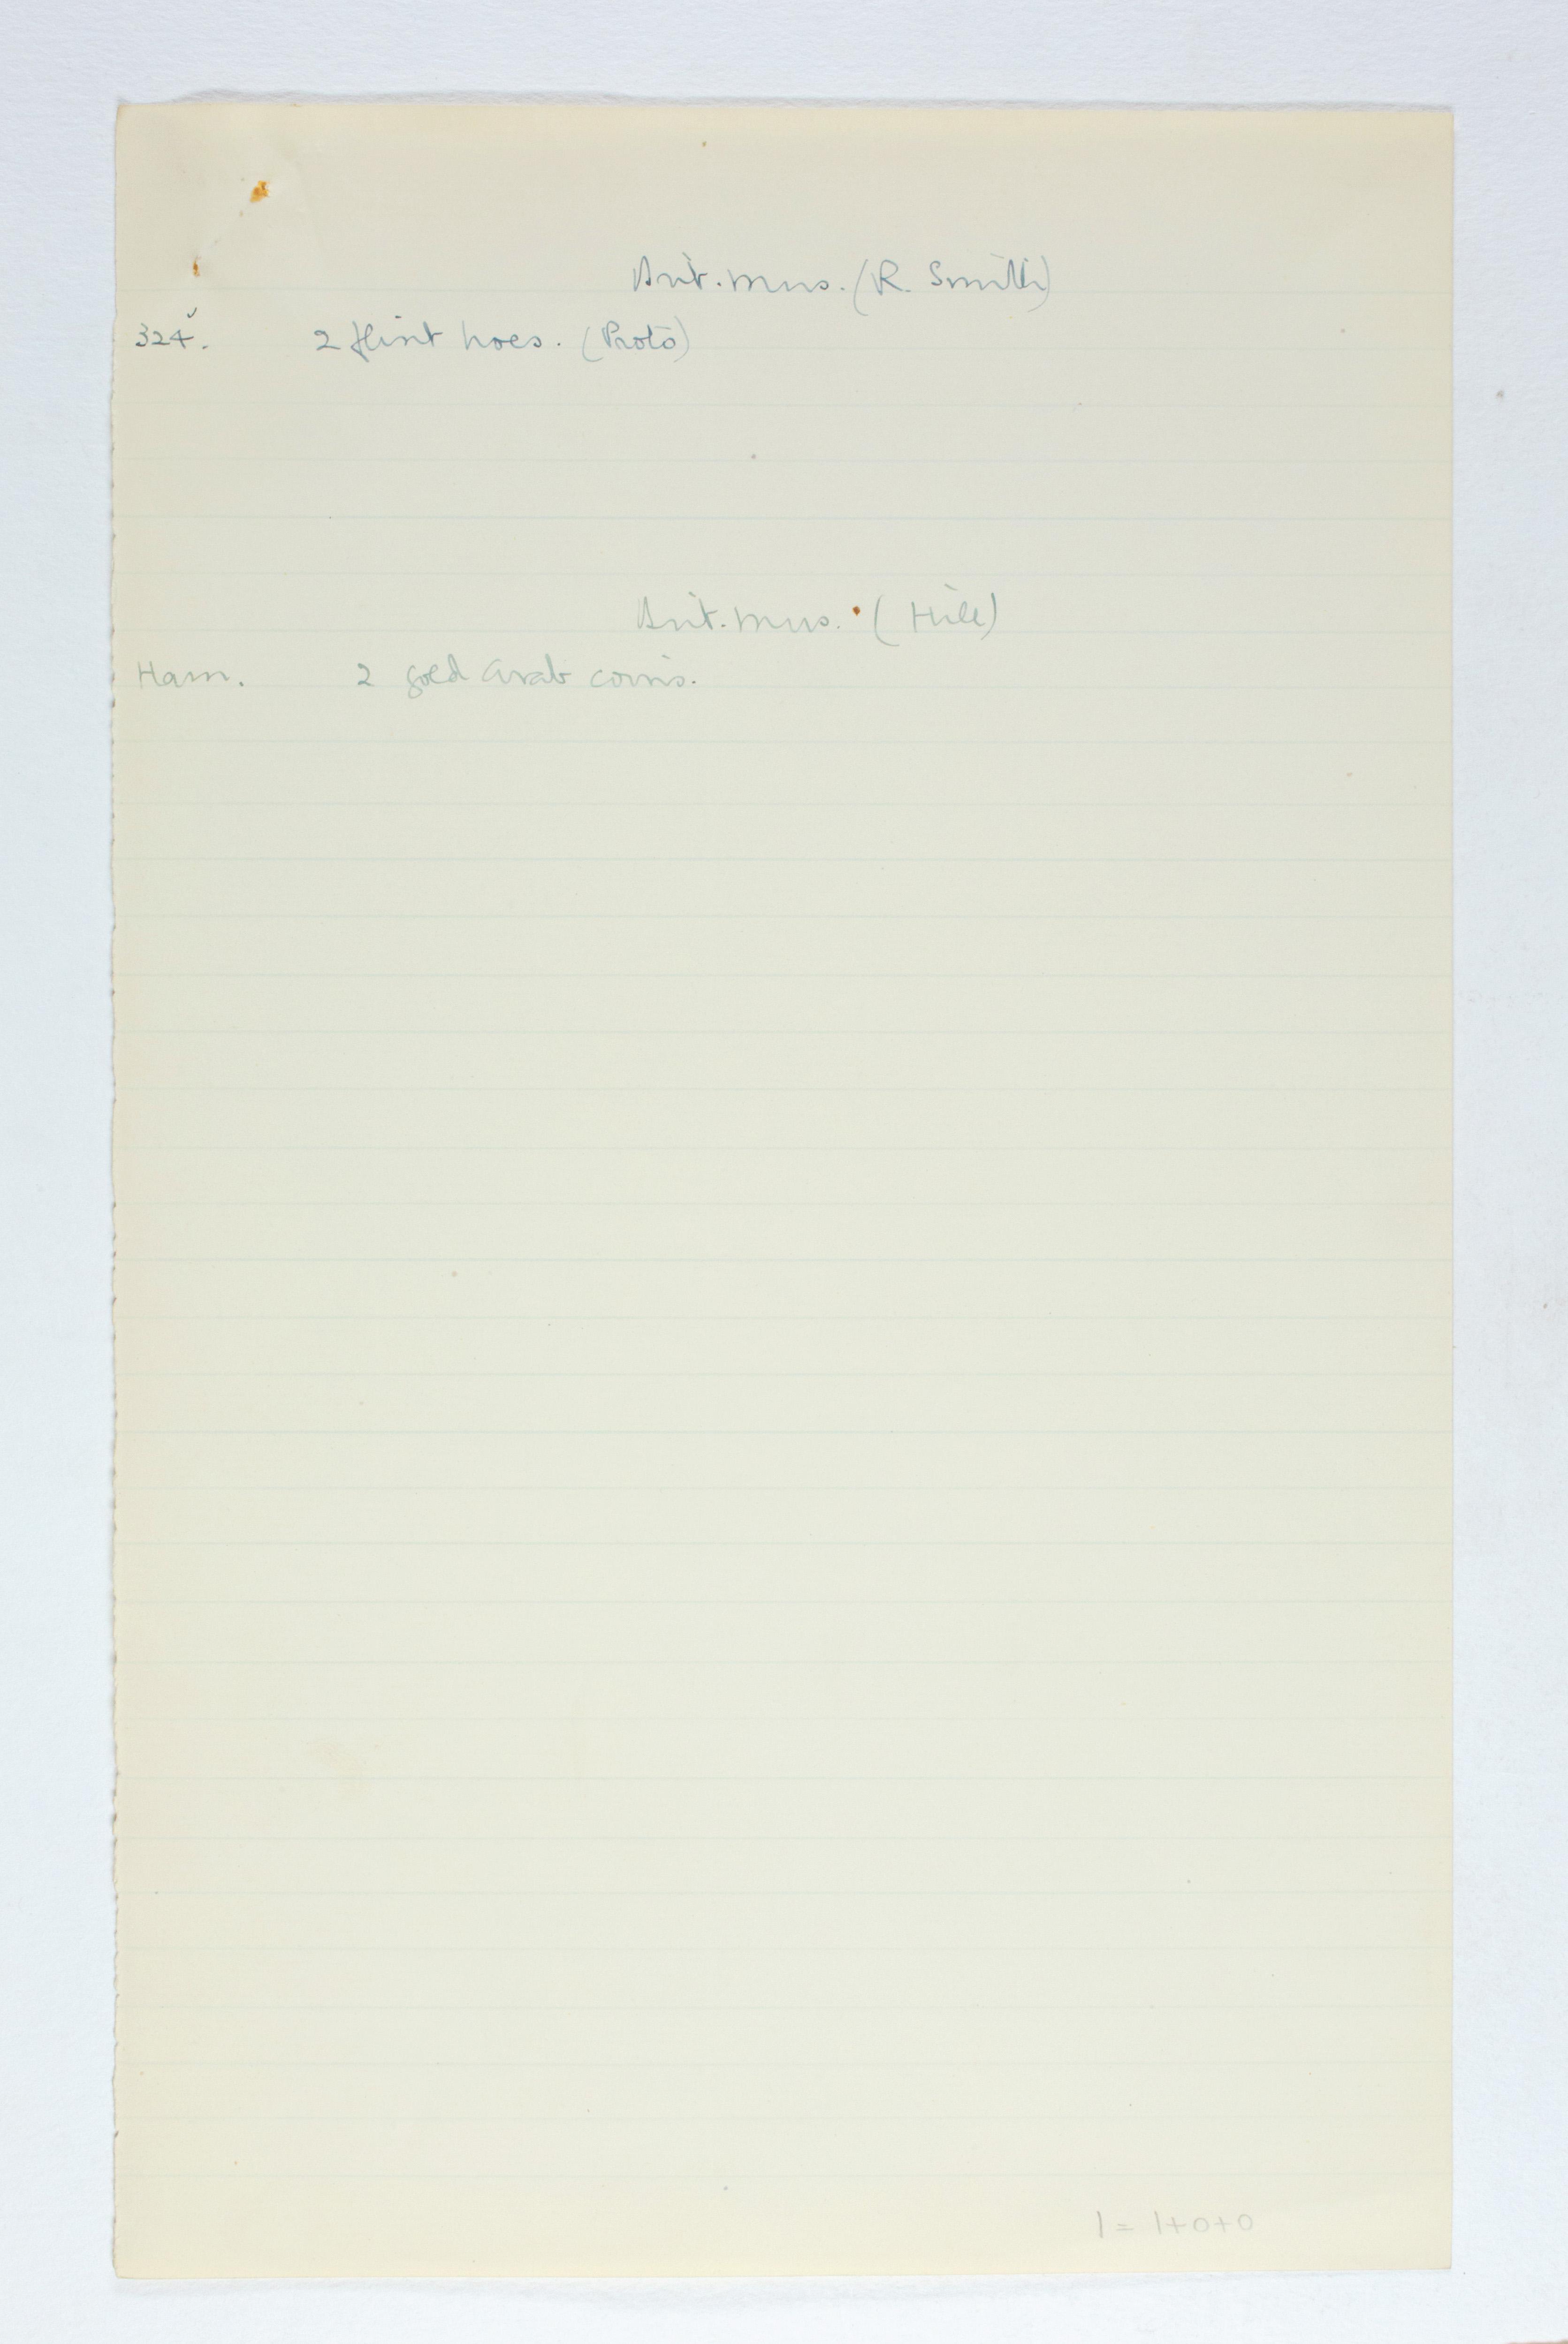 1923-24 Qau el-Kebir, Hemamieh Individual institution list PMA/WFP1/D/27/16.3